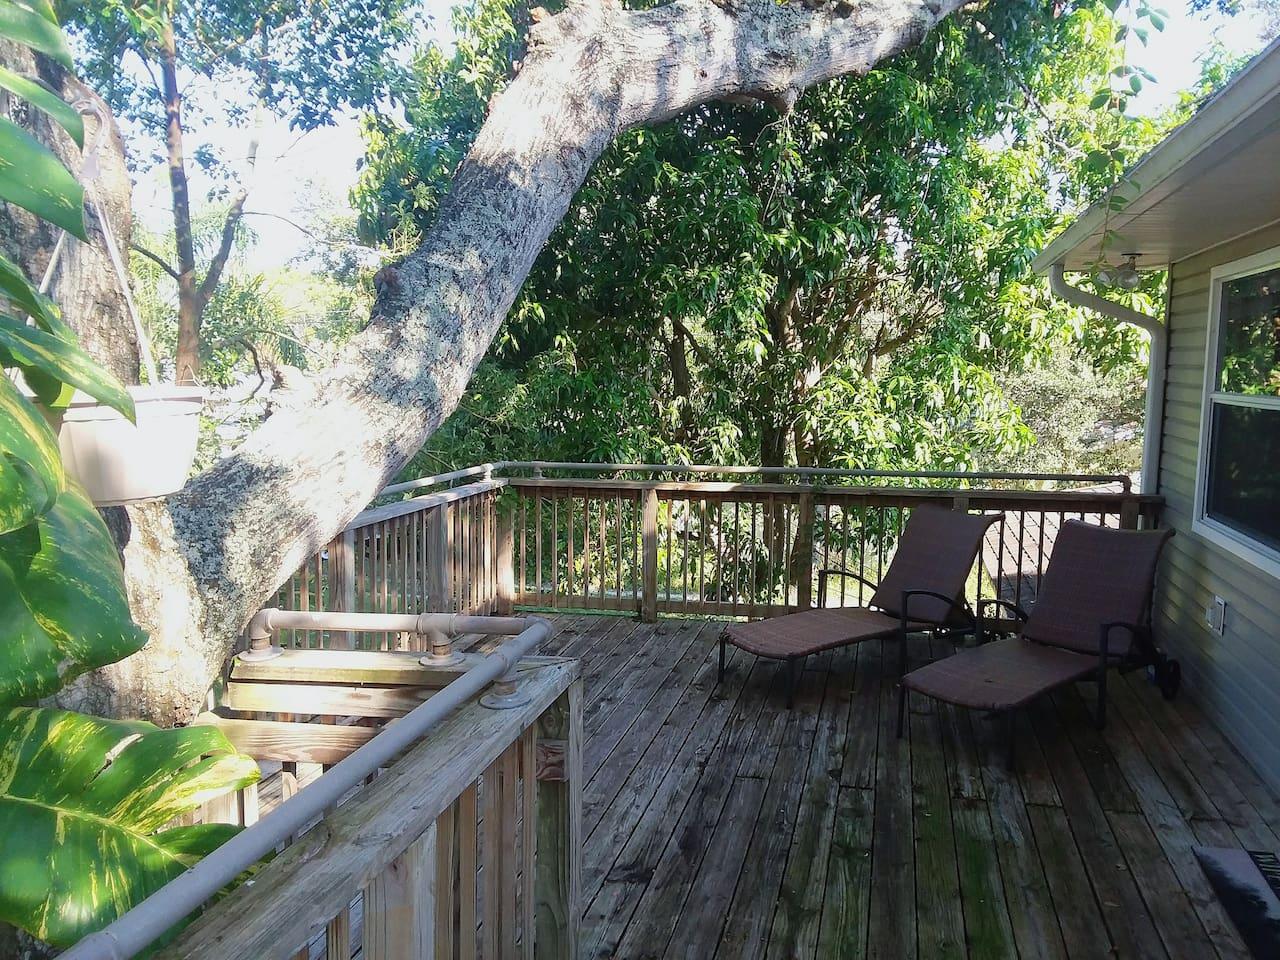 Unique tree house vibe near beachs